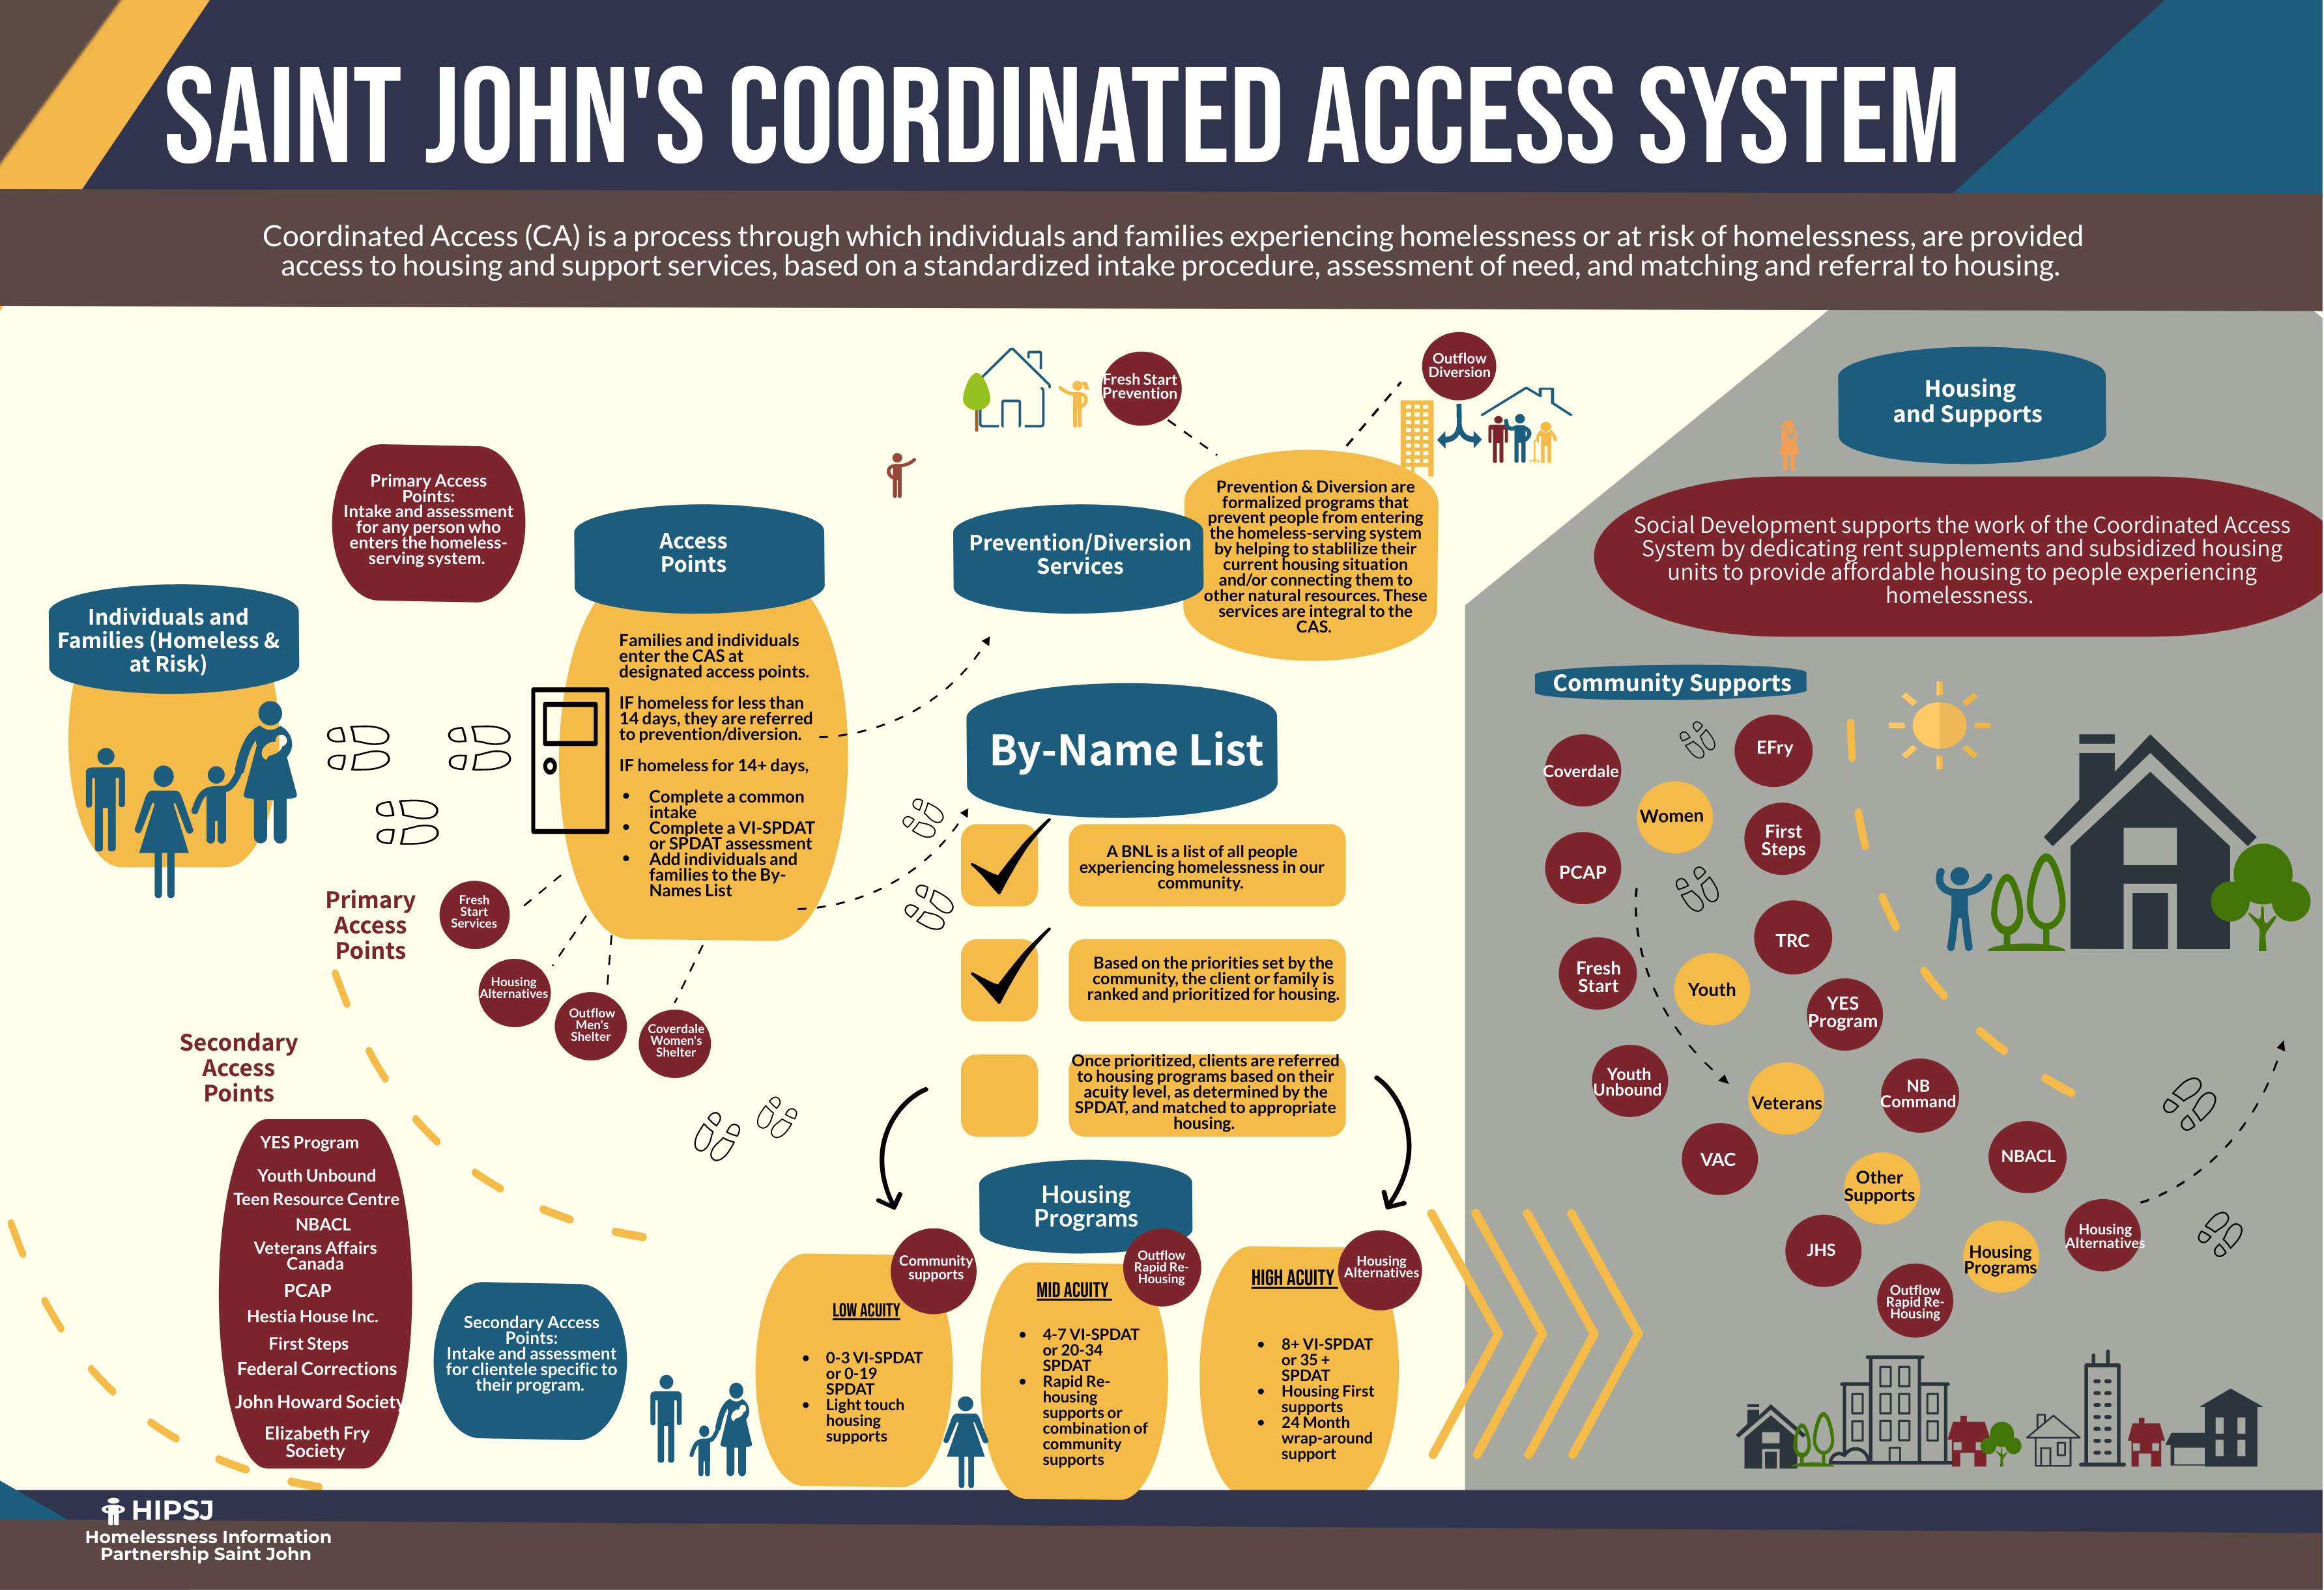 Saint John's Coordinated Access System